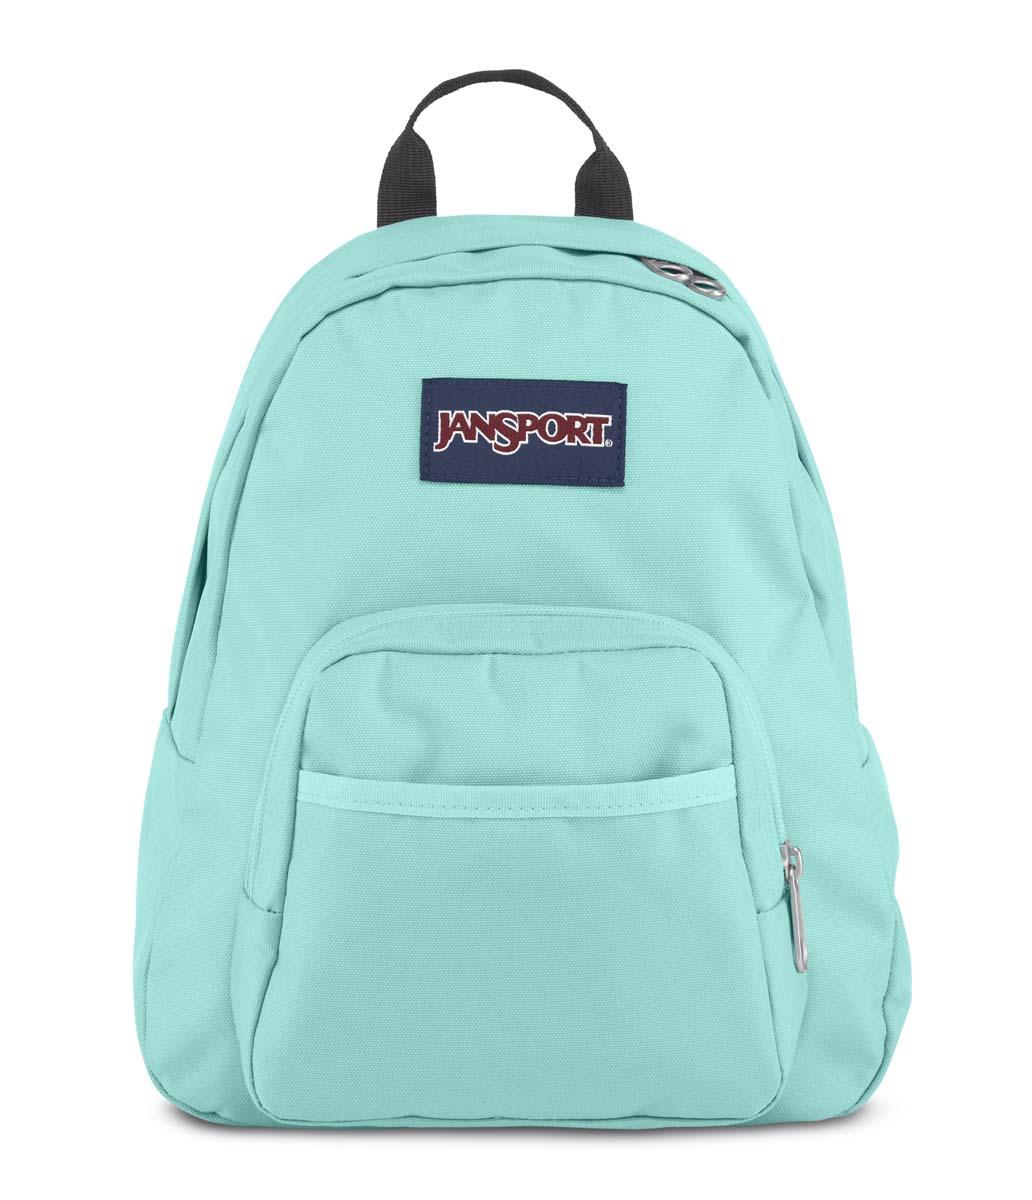 JanSport กระเป๋าเป้ รุ่น Half Pint - Aqua Dash